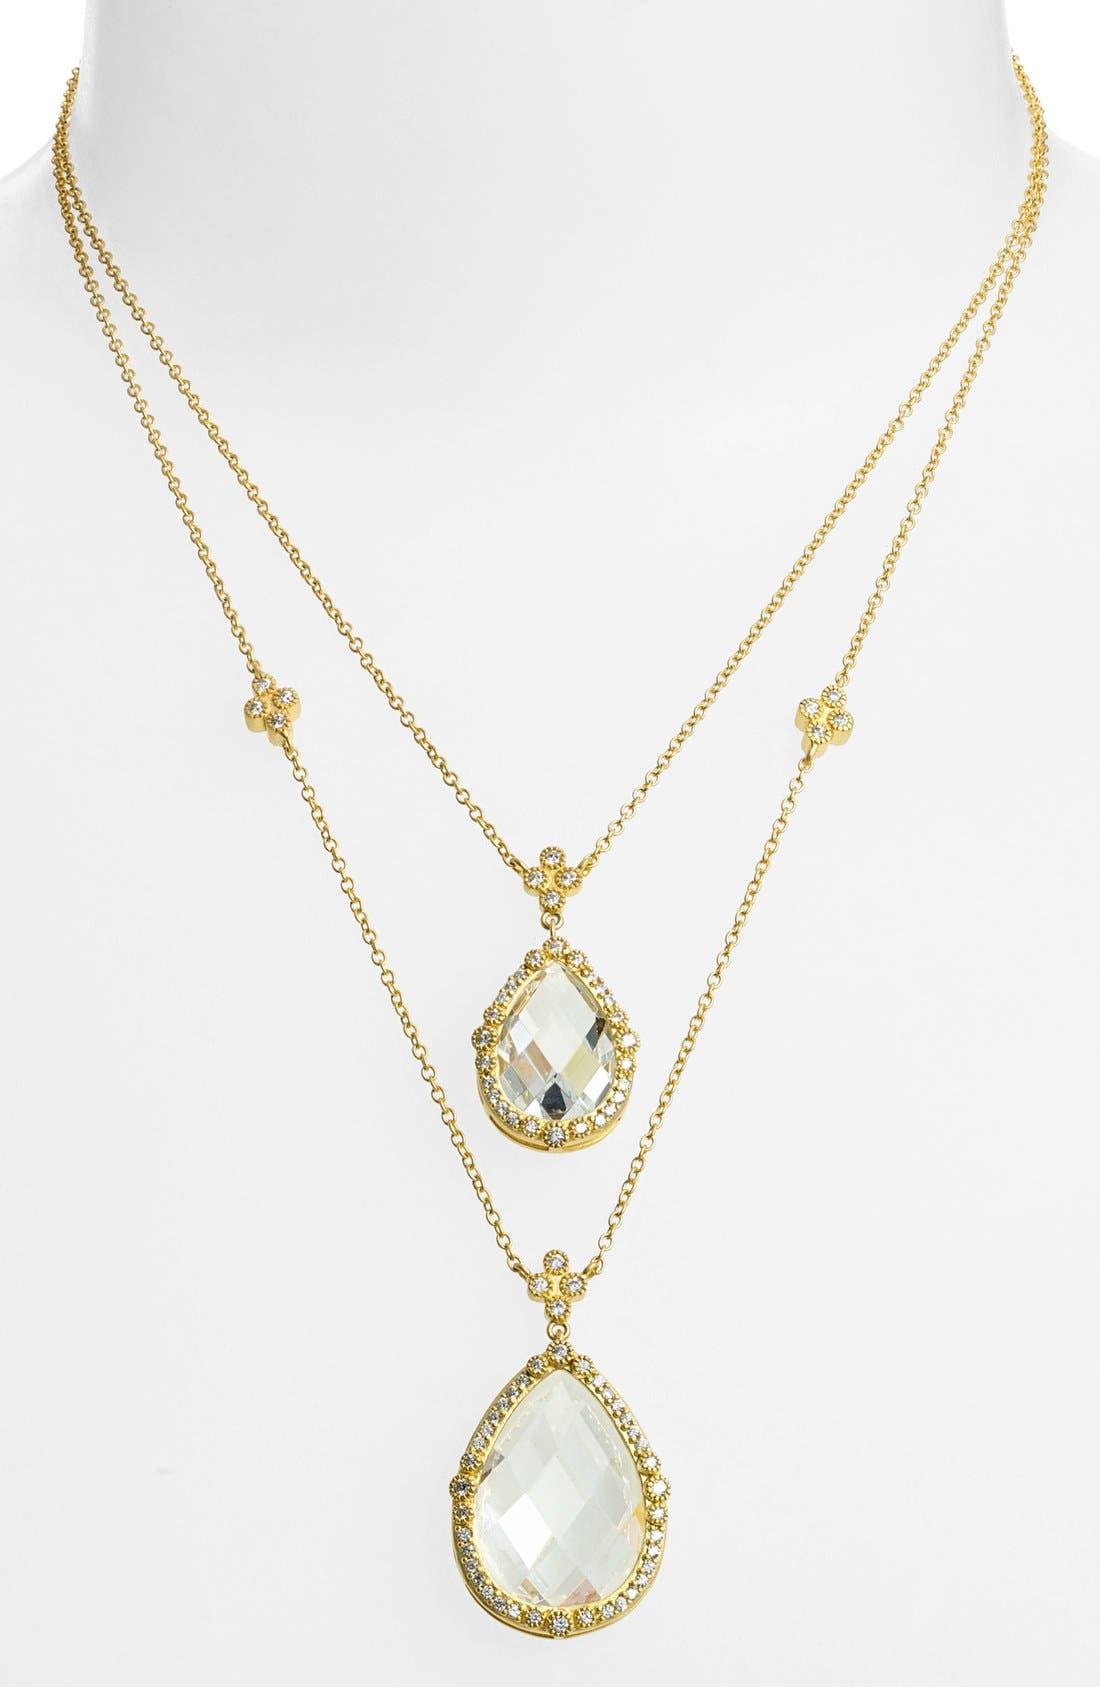 Alternate Image 1 Selected - FREIDA ROTHMAN 'Metropolitan' Multistrand Pendant Necklace